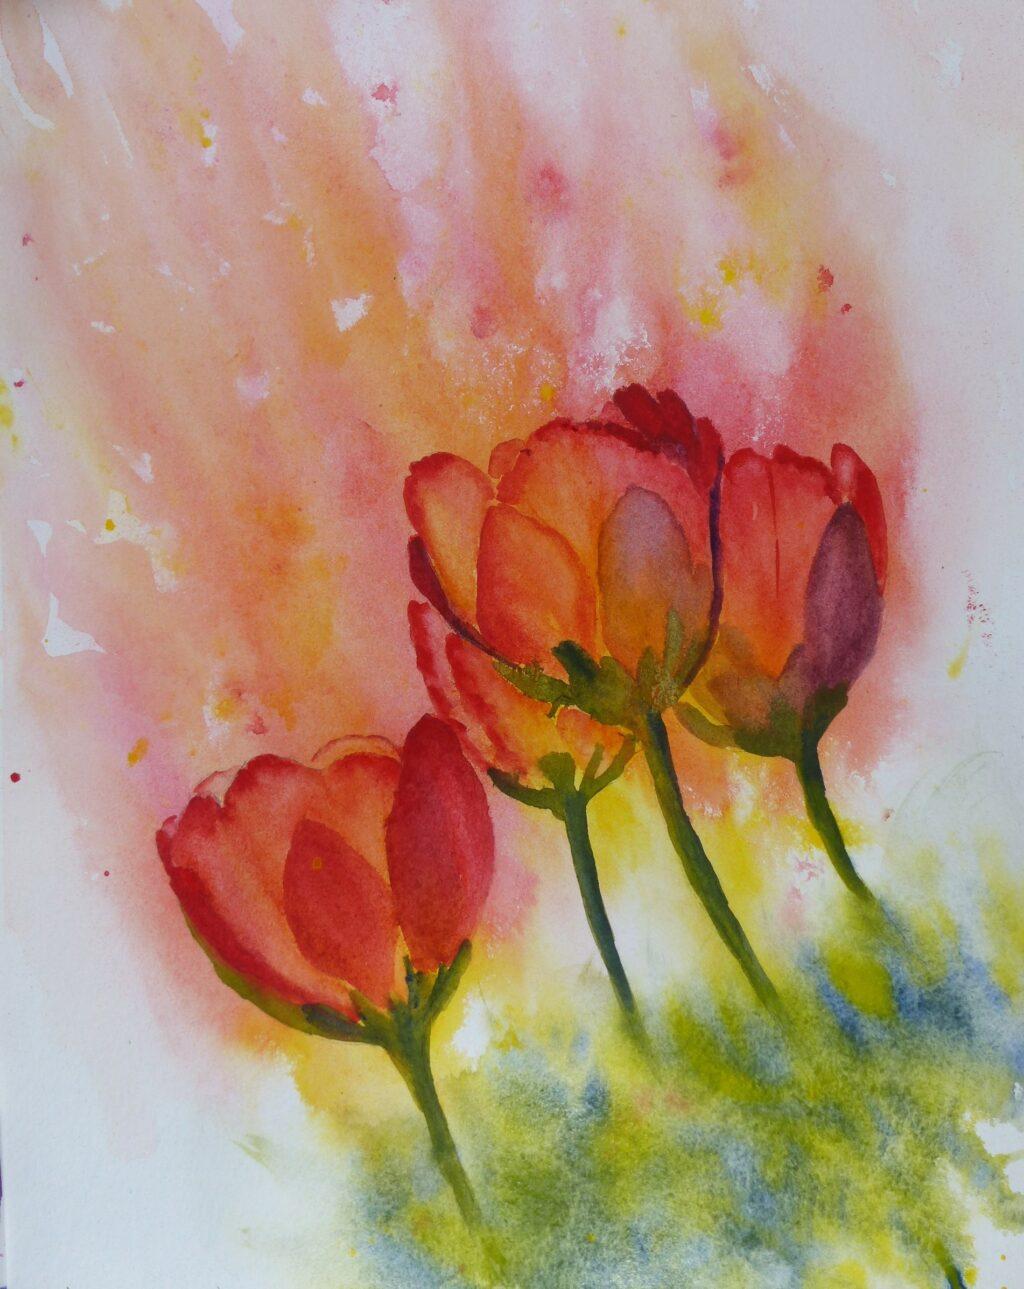 Aquarelle : Tulipes